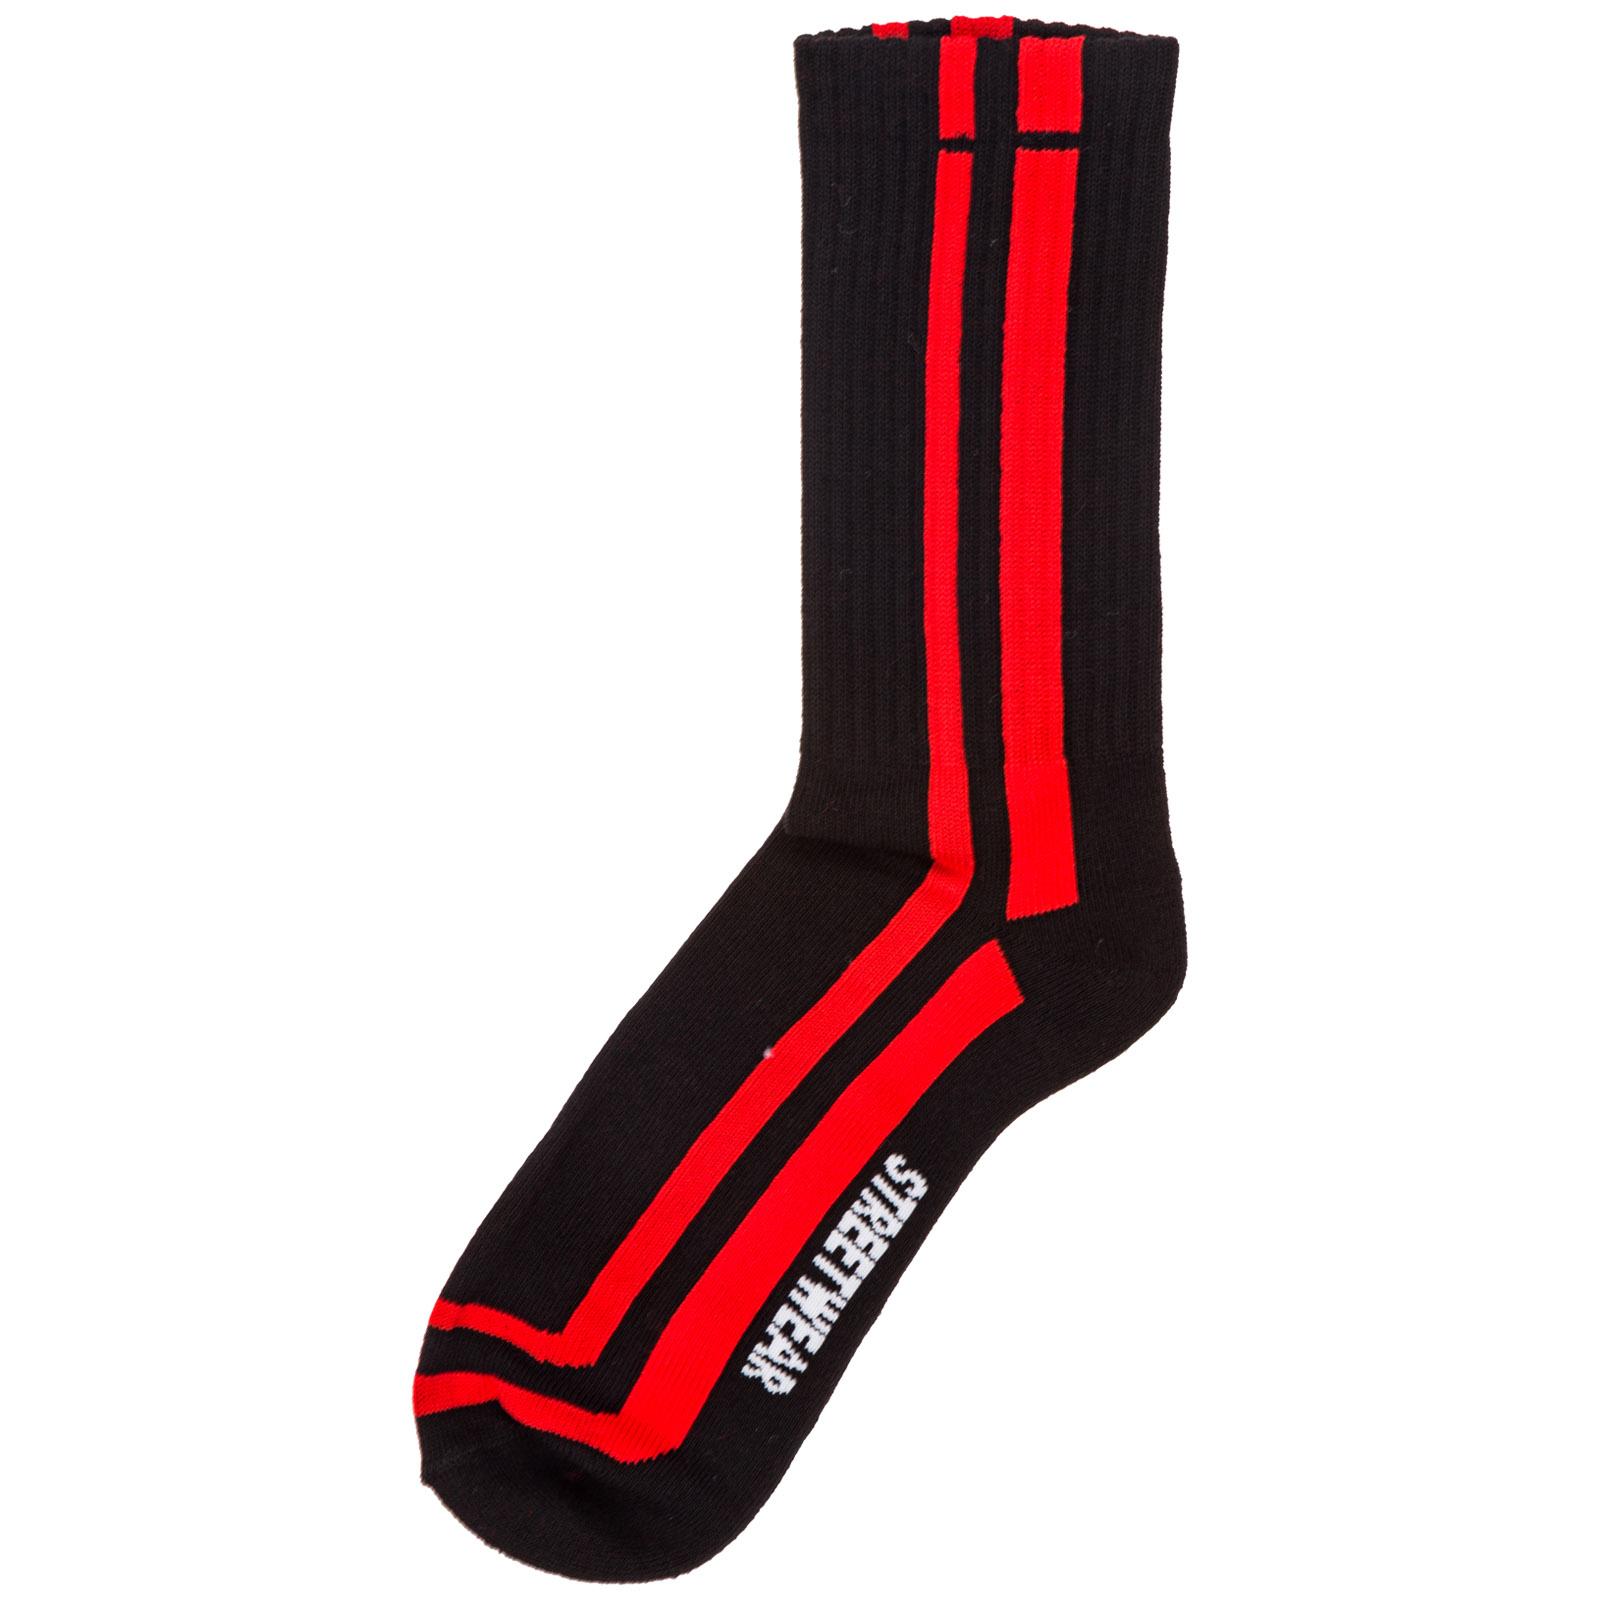 Low socks uomo round